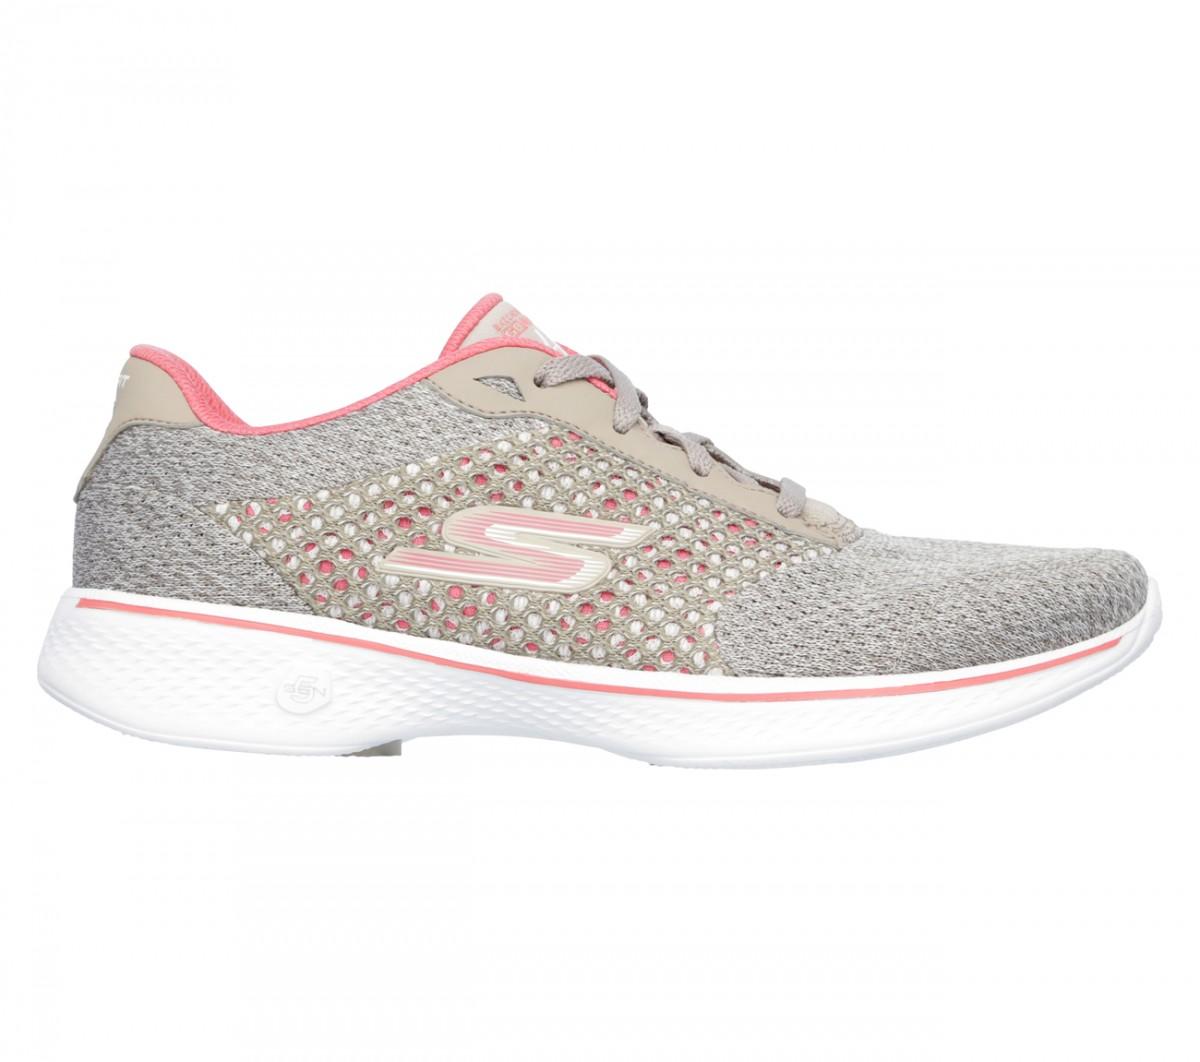 786b582df6 Bizz Store - Tênis Feminino Skechers Go Walk 4 Exceed Caminhada